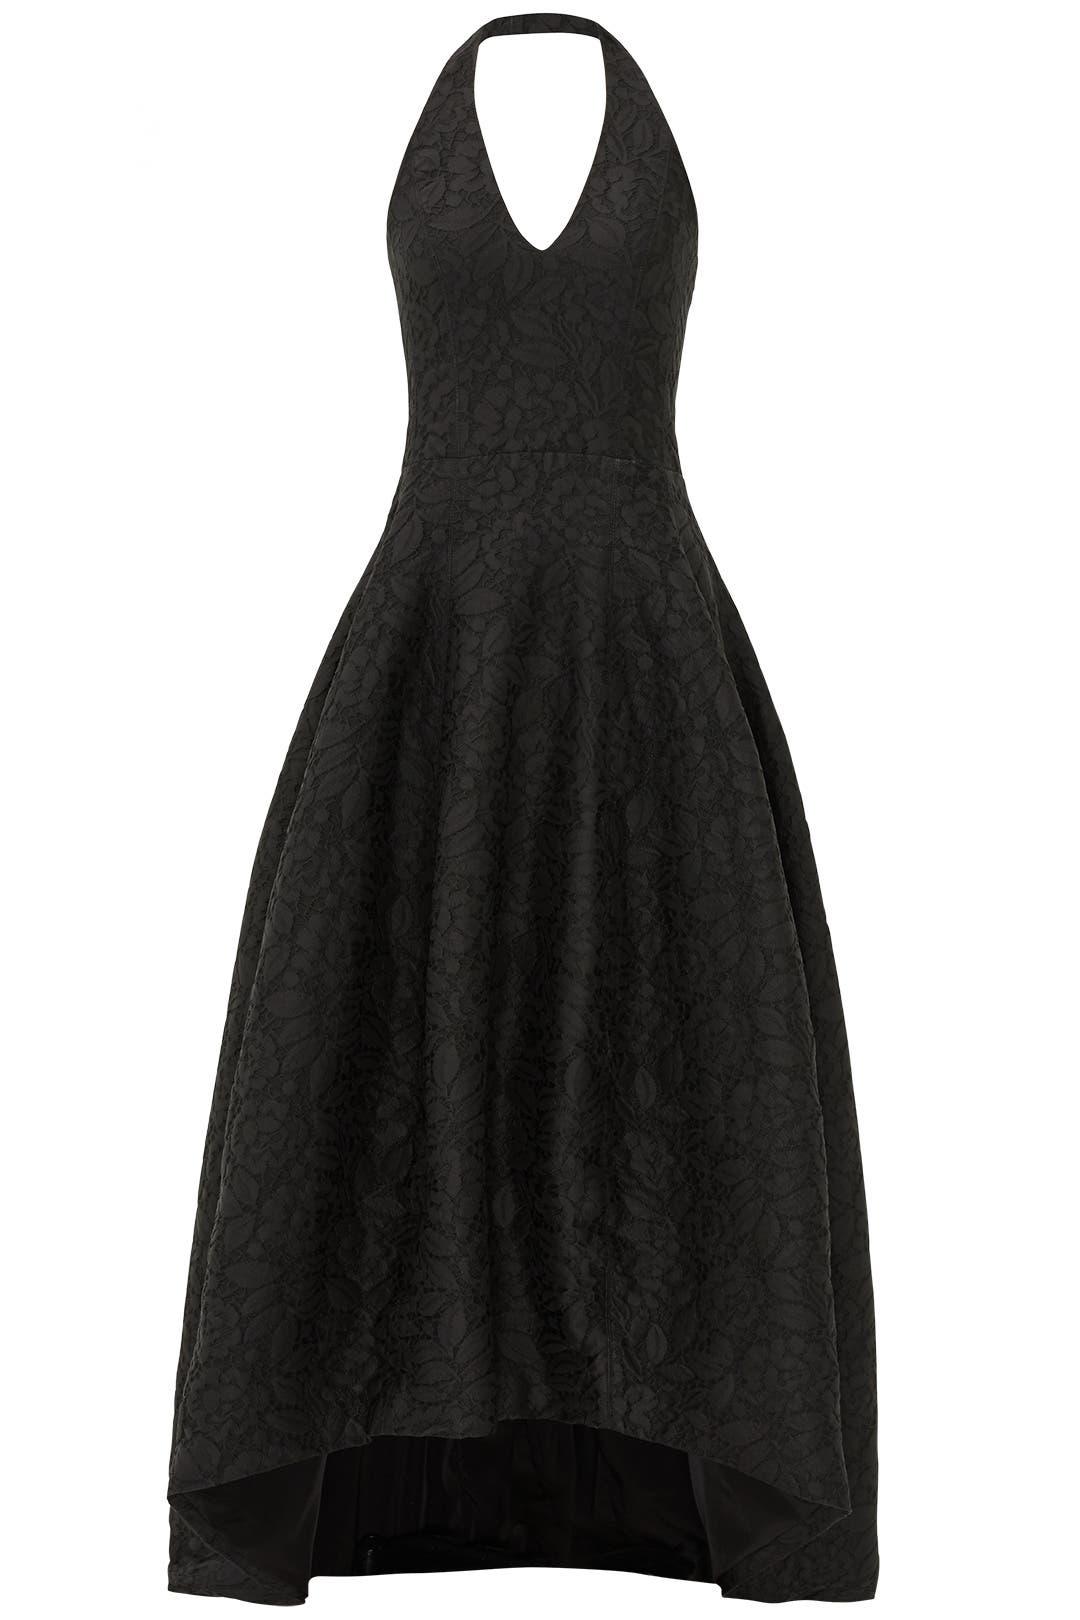 Caraibos cocktail dress